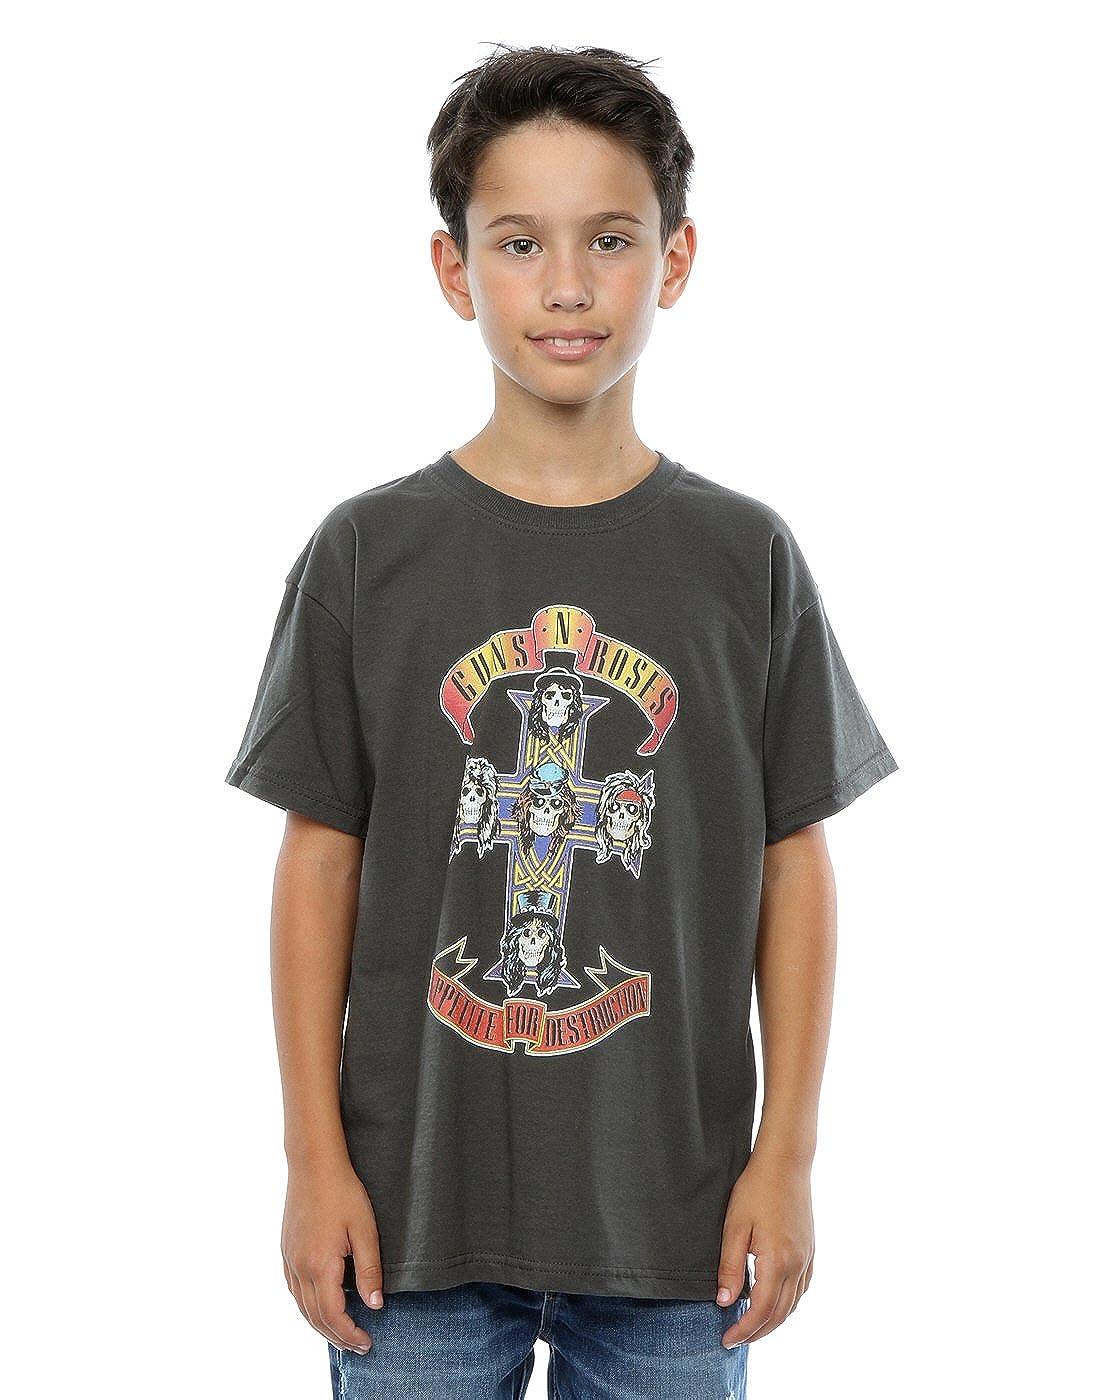 Websi Wihey Black Snail Volution Shape Fashion Boys t Shirt Youth